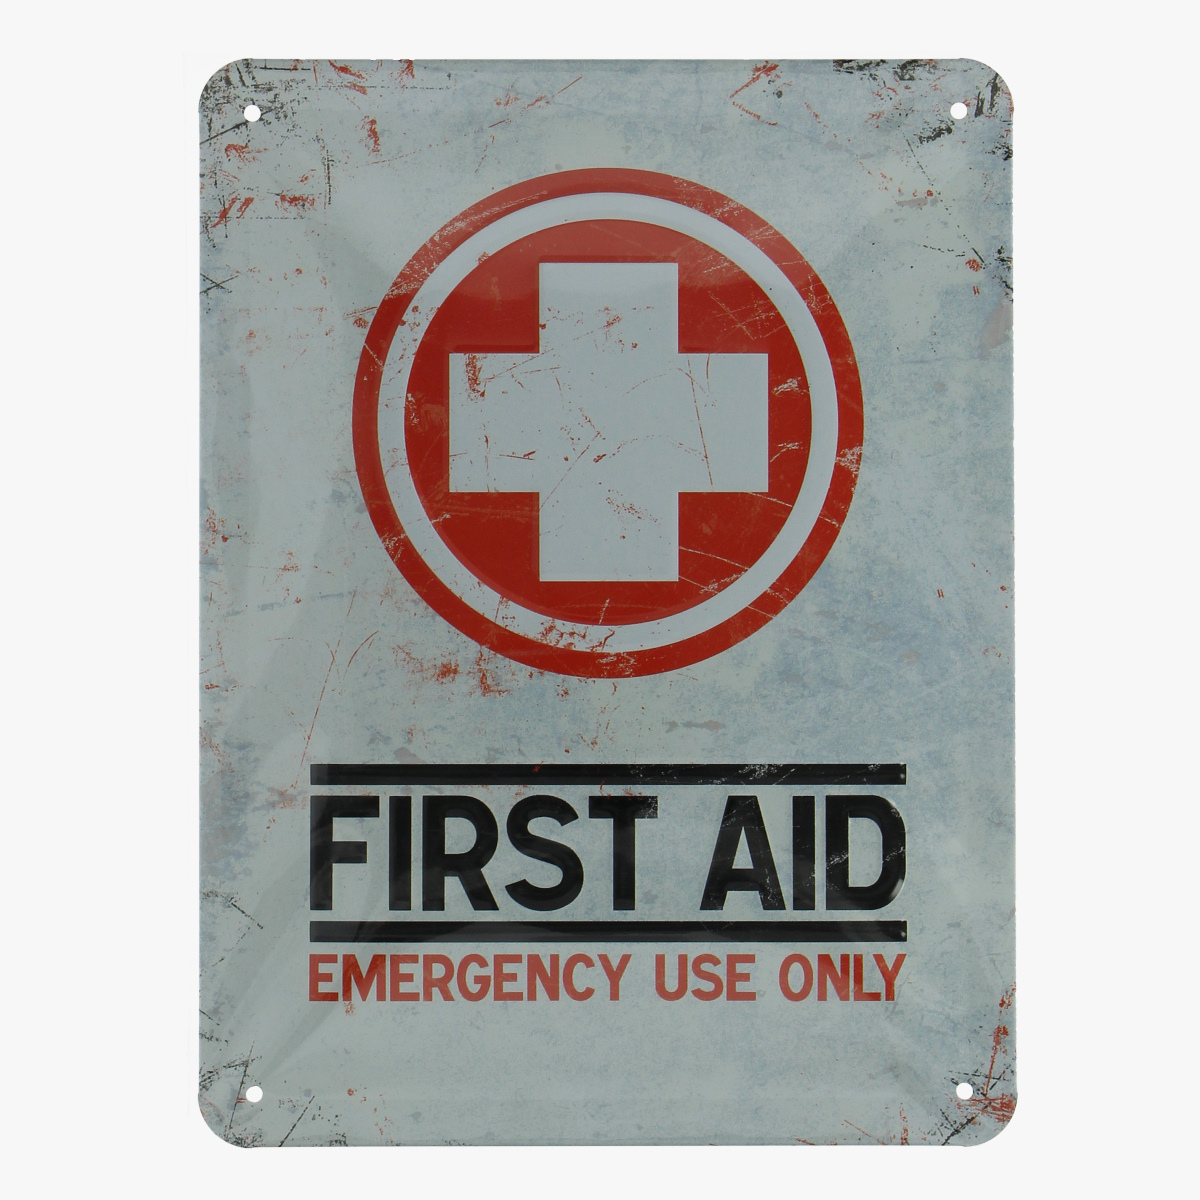 Afbeeldingen van blikken bordje first aid emergency use only